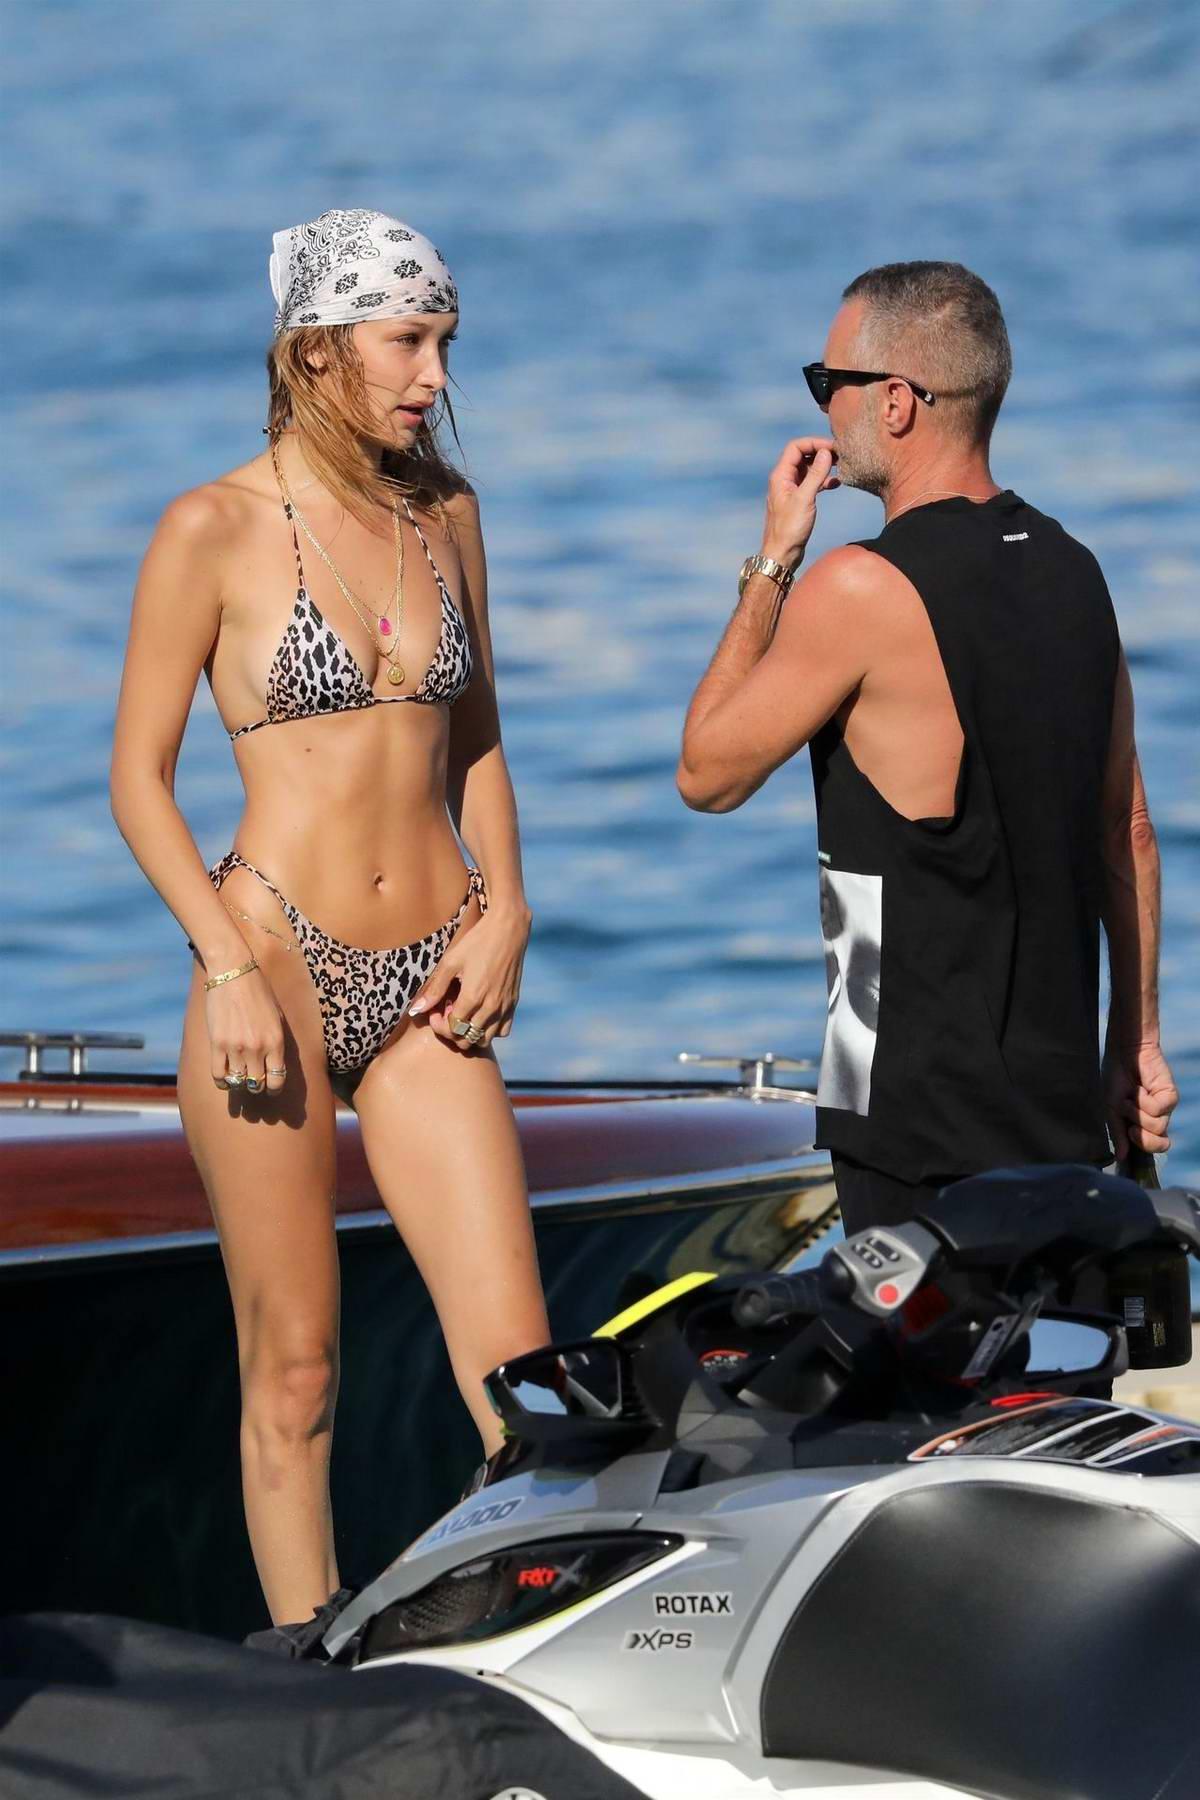 Bella Hadid rocks a leopard print bikini as she rides a jet ski and enjoys the beach in Mykonos, Greece